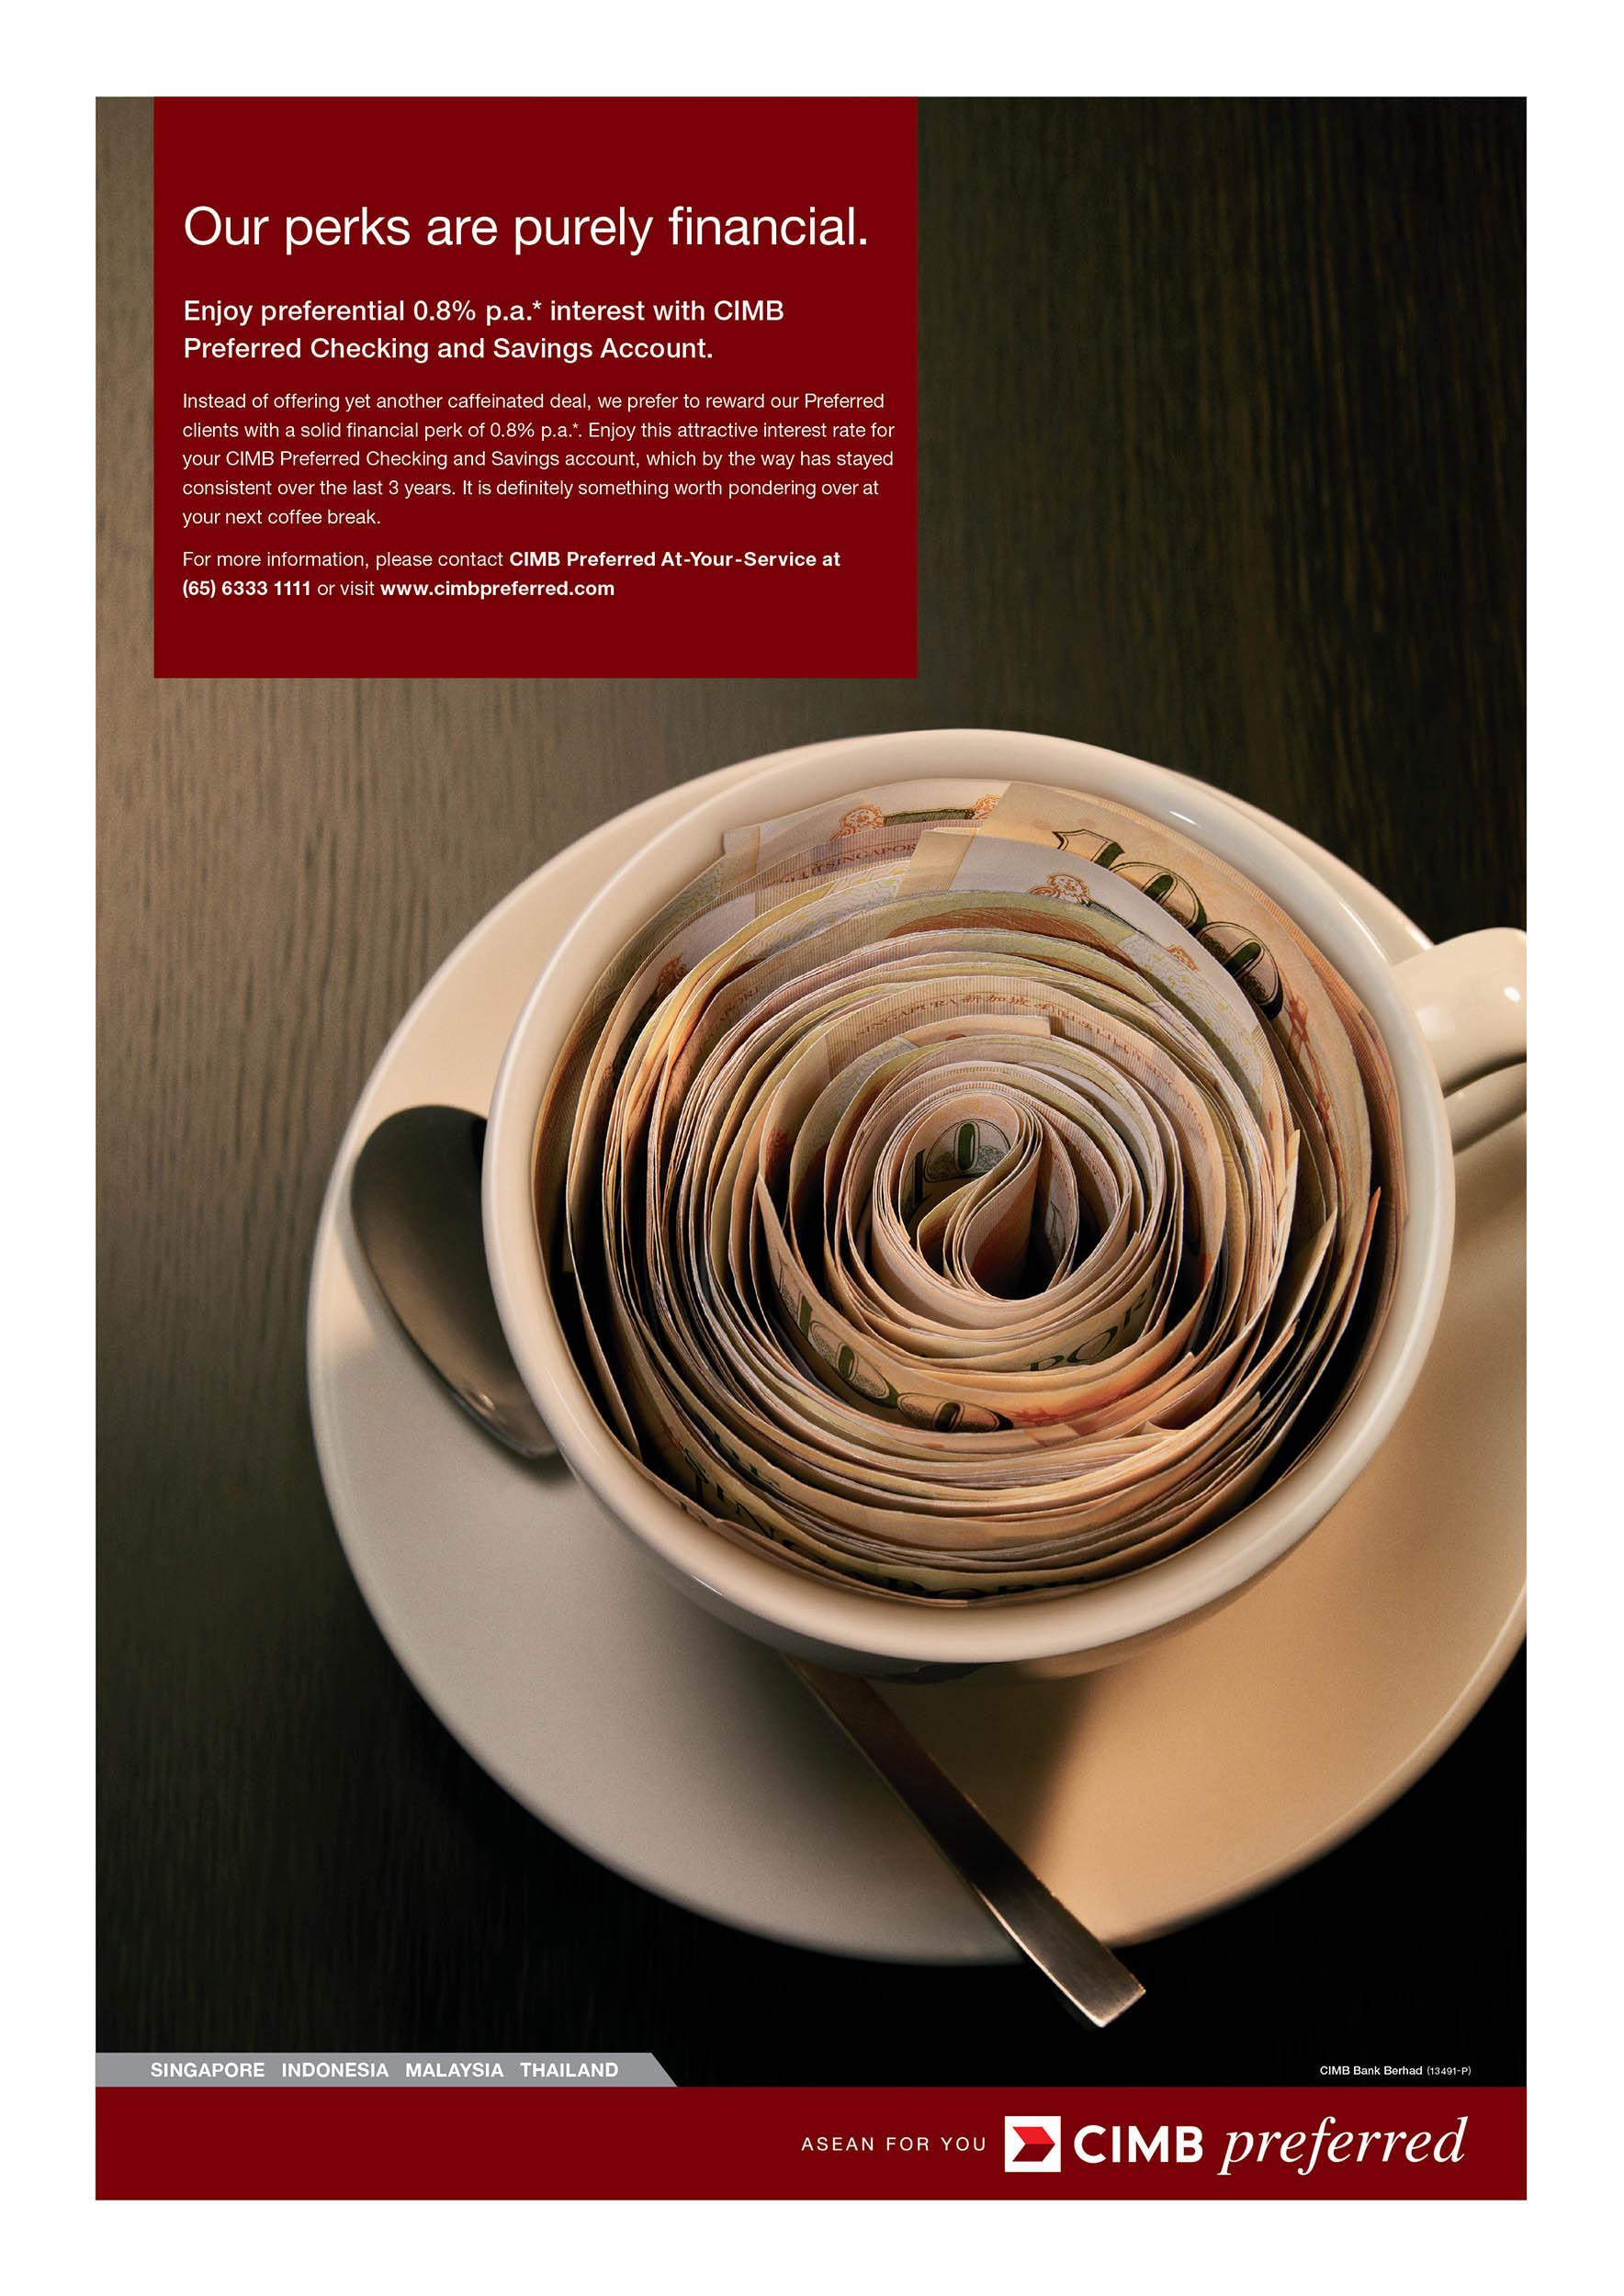 CIMB_coffee2.jpg